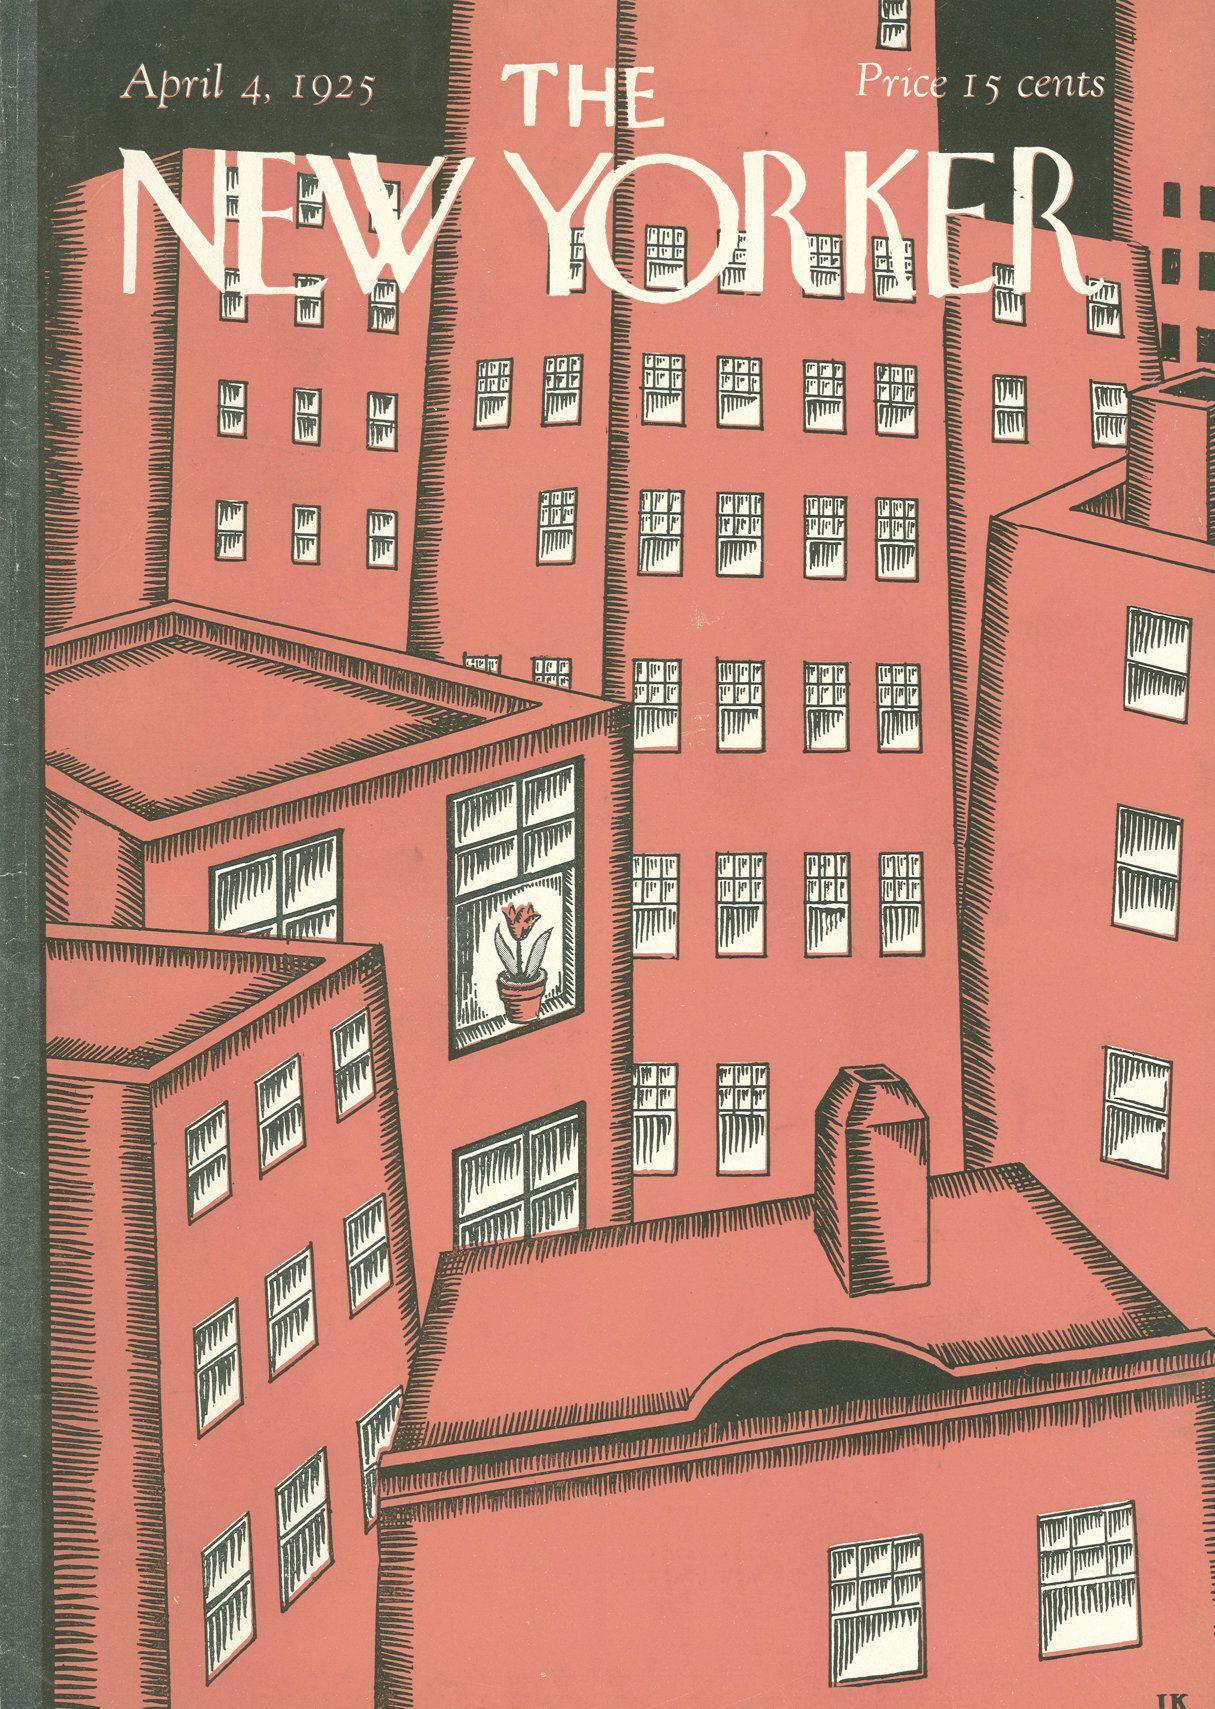 The New Yorker - Saturday, April 4, 1925 - Issue # 7 - Vol. 1 - N° 7 - Cover by : Ilonka Karasz